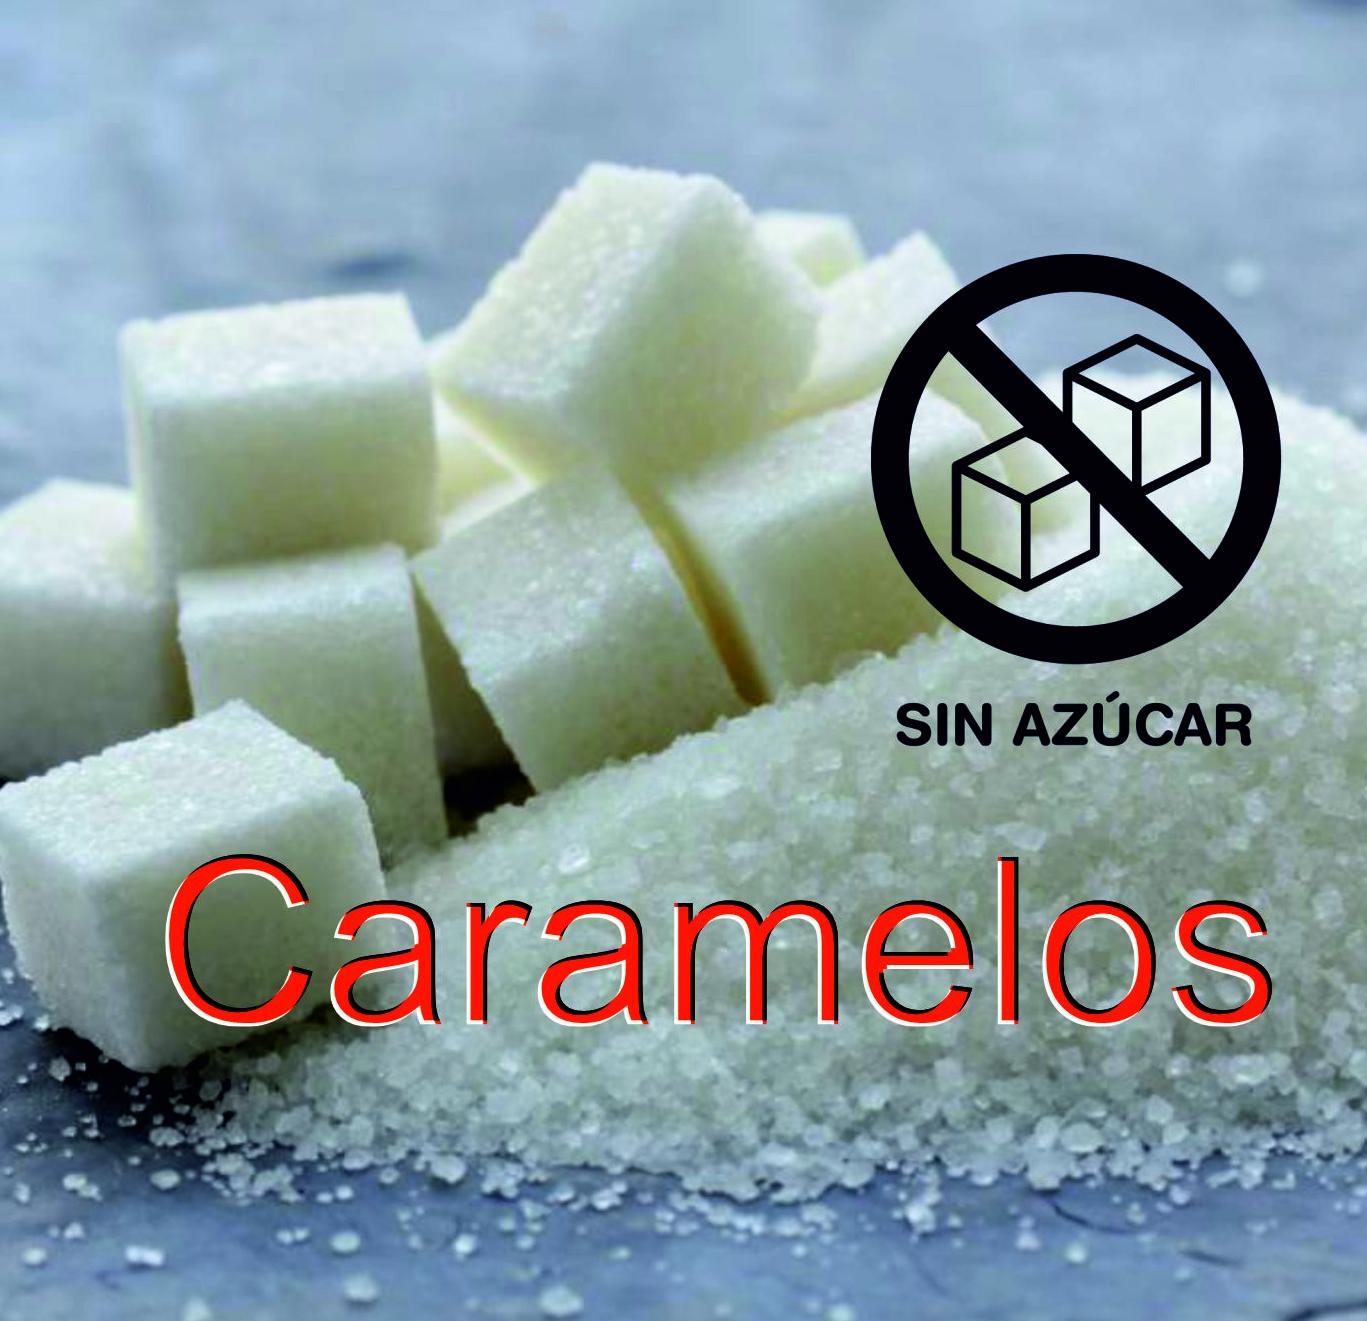 Caramelos sin azucar